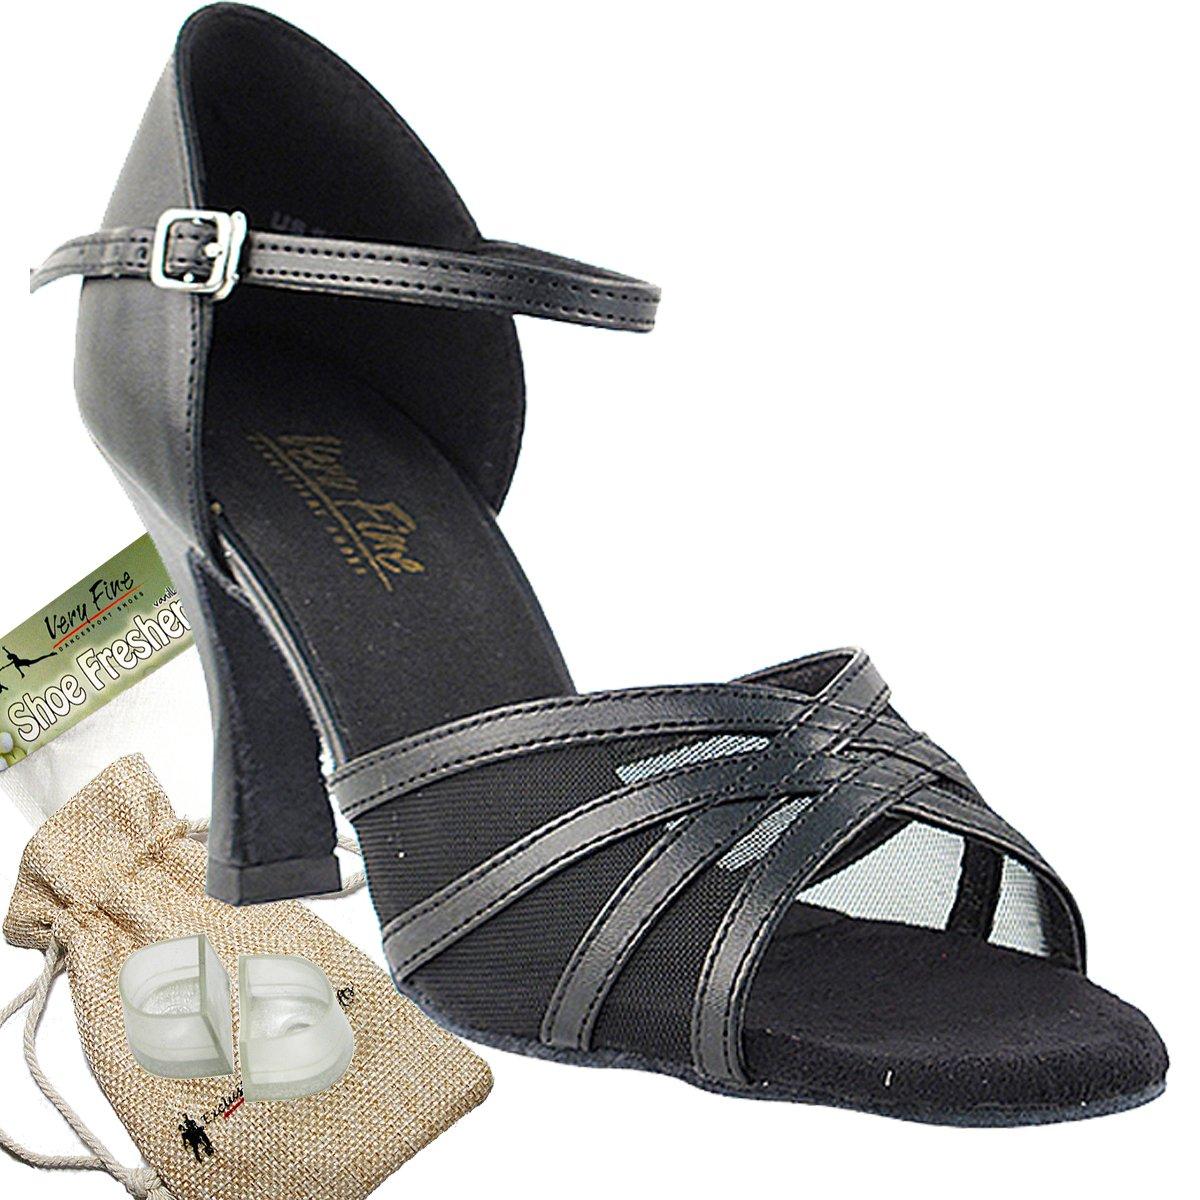 Women's Ballroom Dance Shoes Tango Wedding Salsa Dance Shoes Black Leather & Black Mesh 6027EB Comfortable - Very Fine 3'' Heel 8 M US [Bundle of 5]